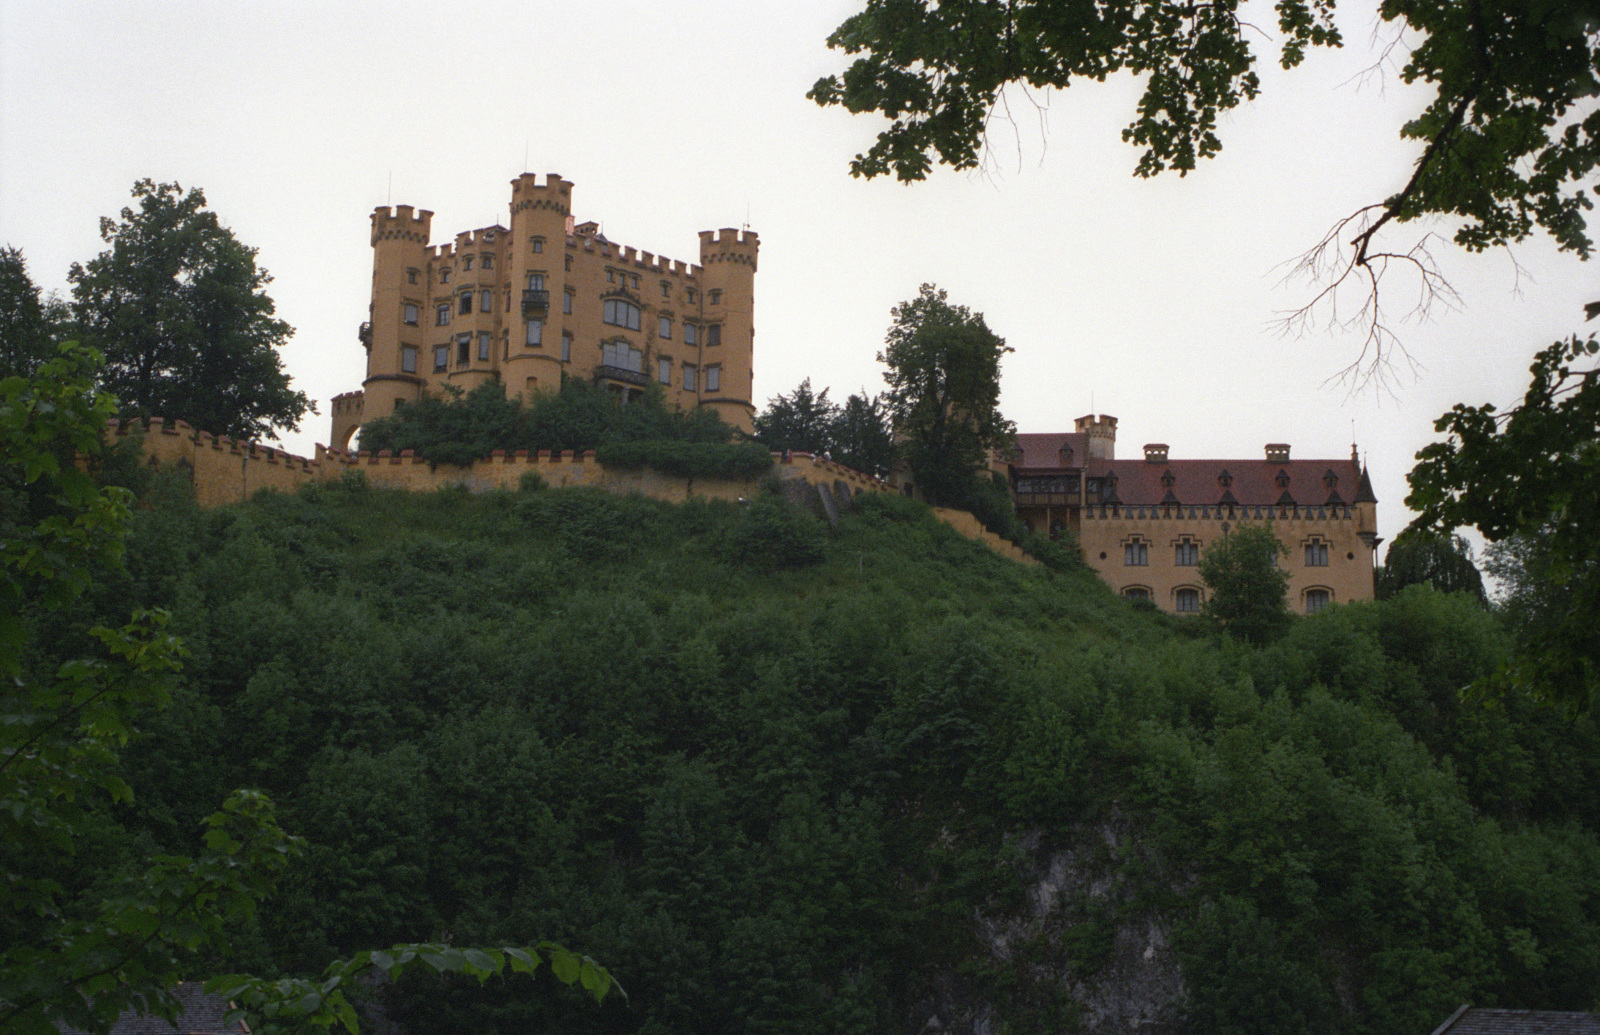 Ludwig's Childhood Home